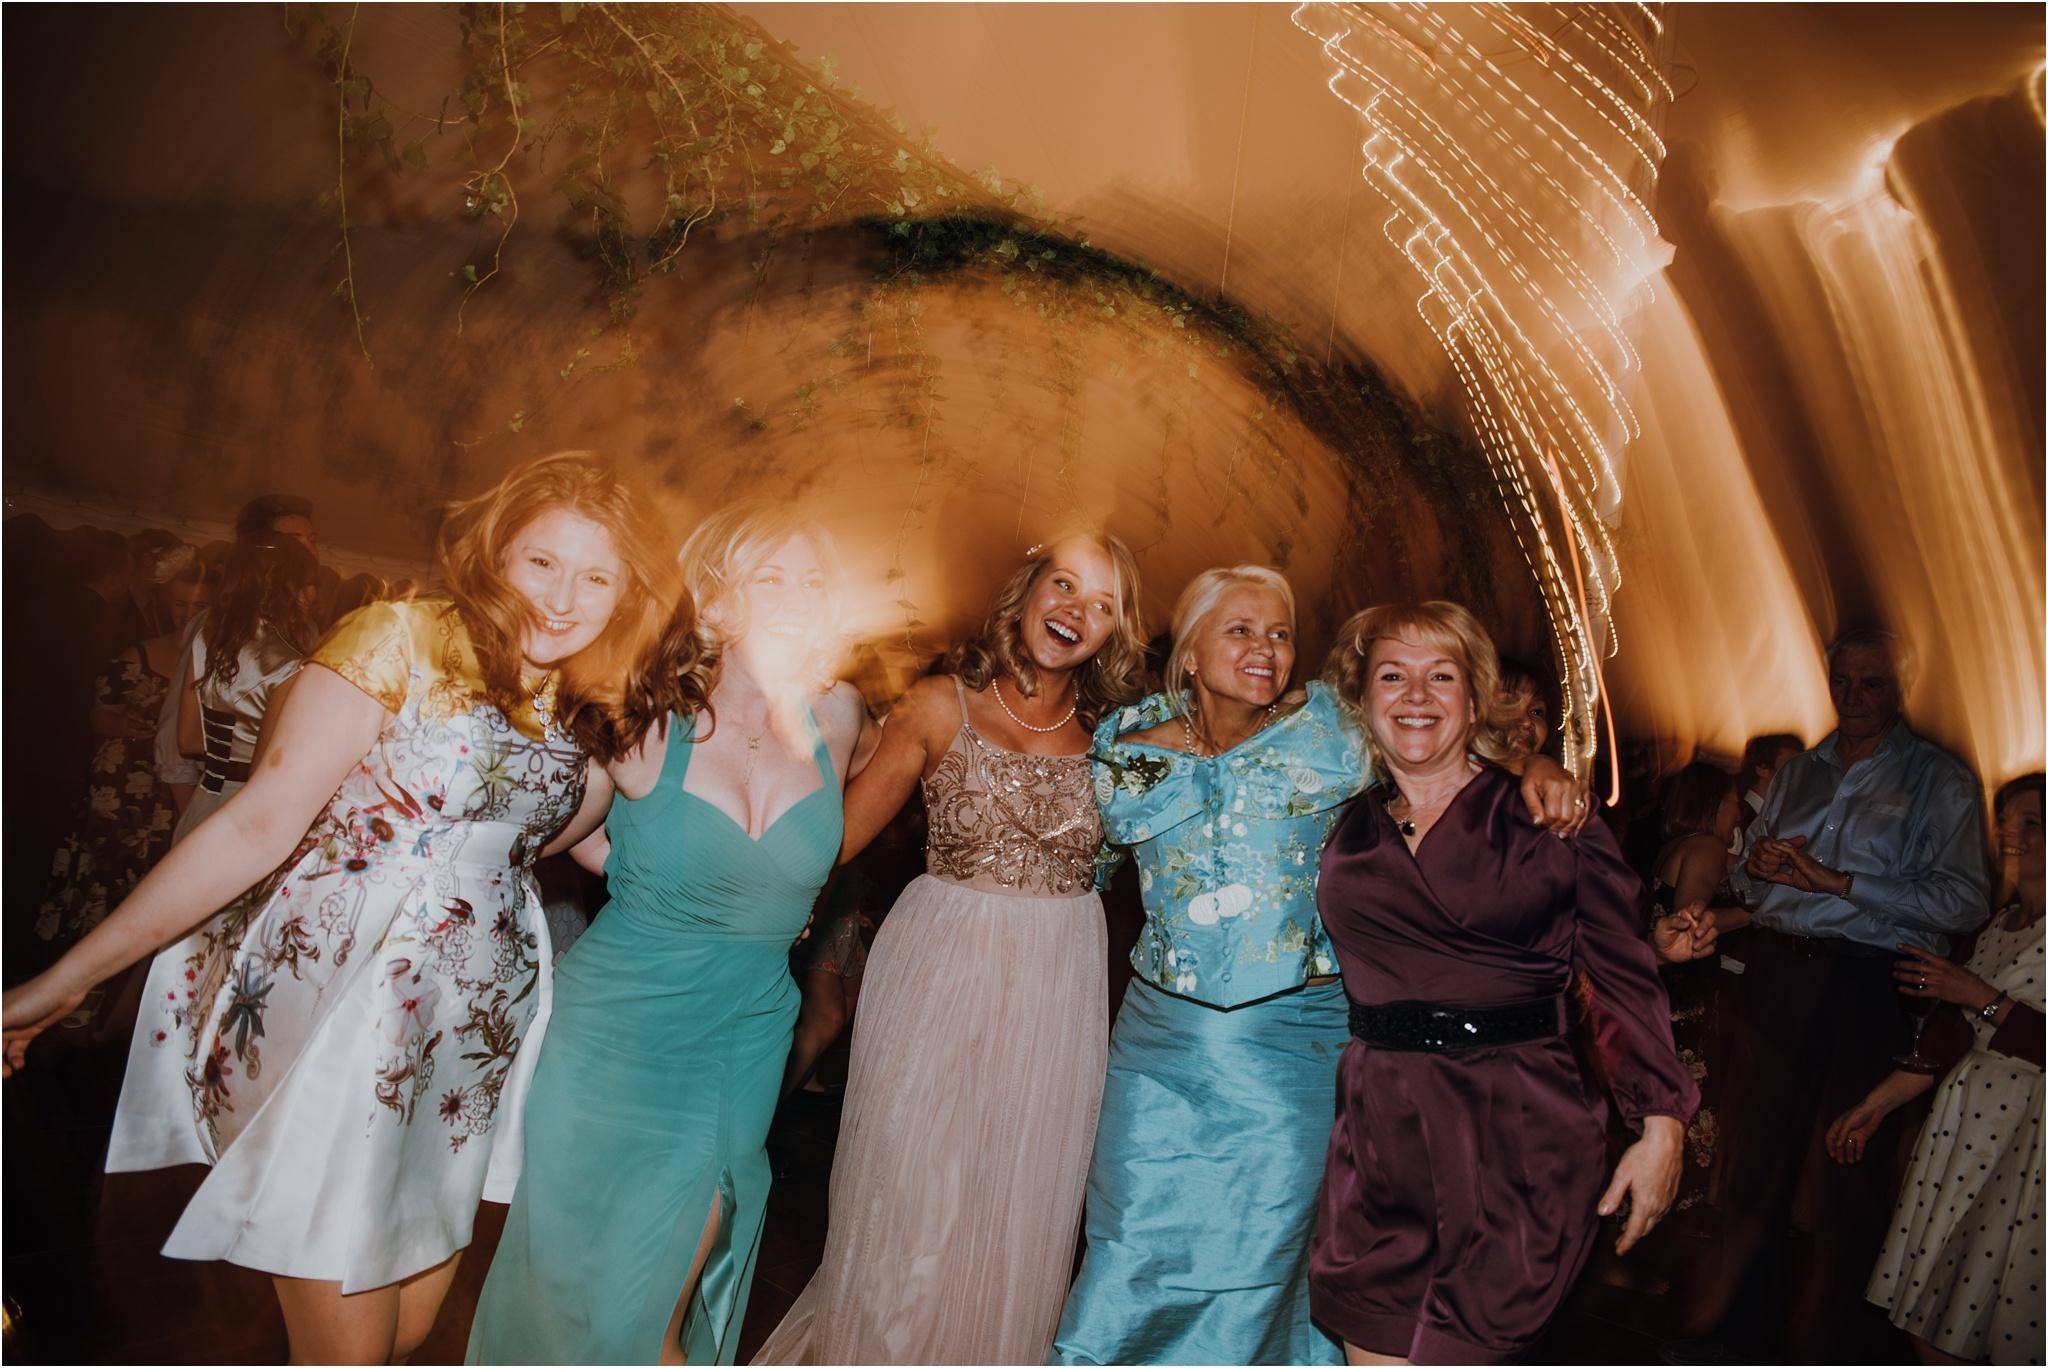 Outdoor-country-wedding-Edinburgh-photographer__0151.jpg